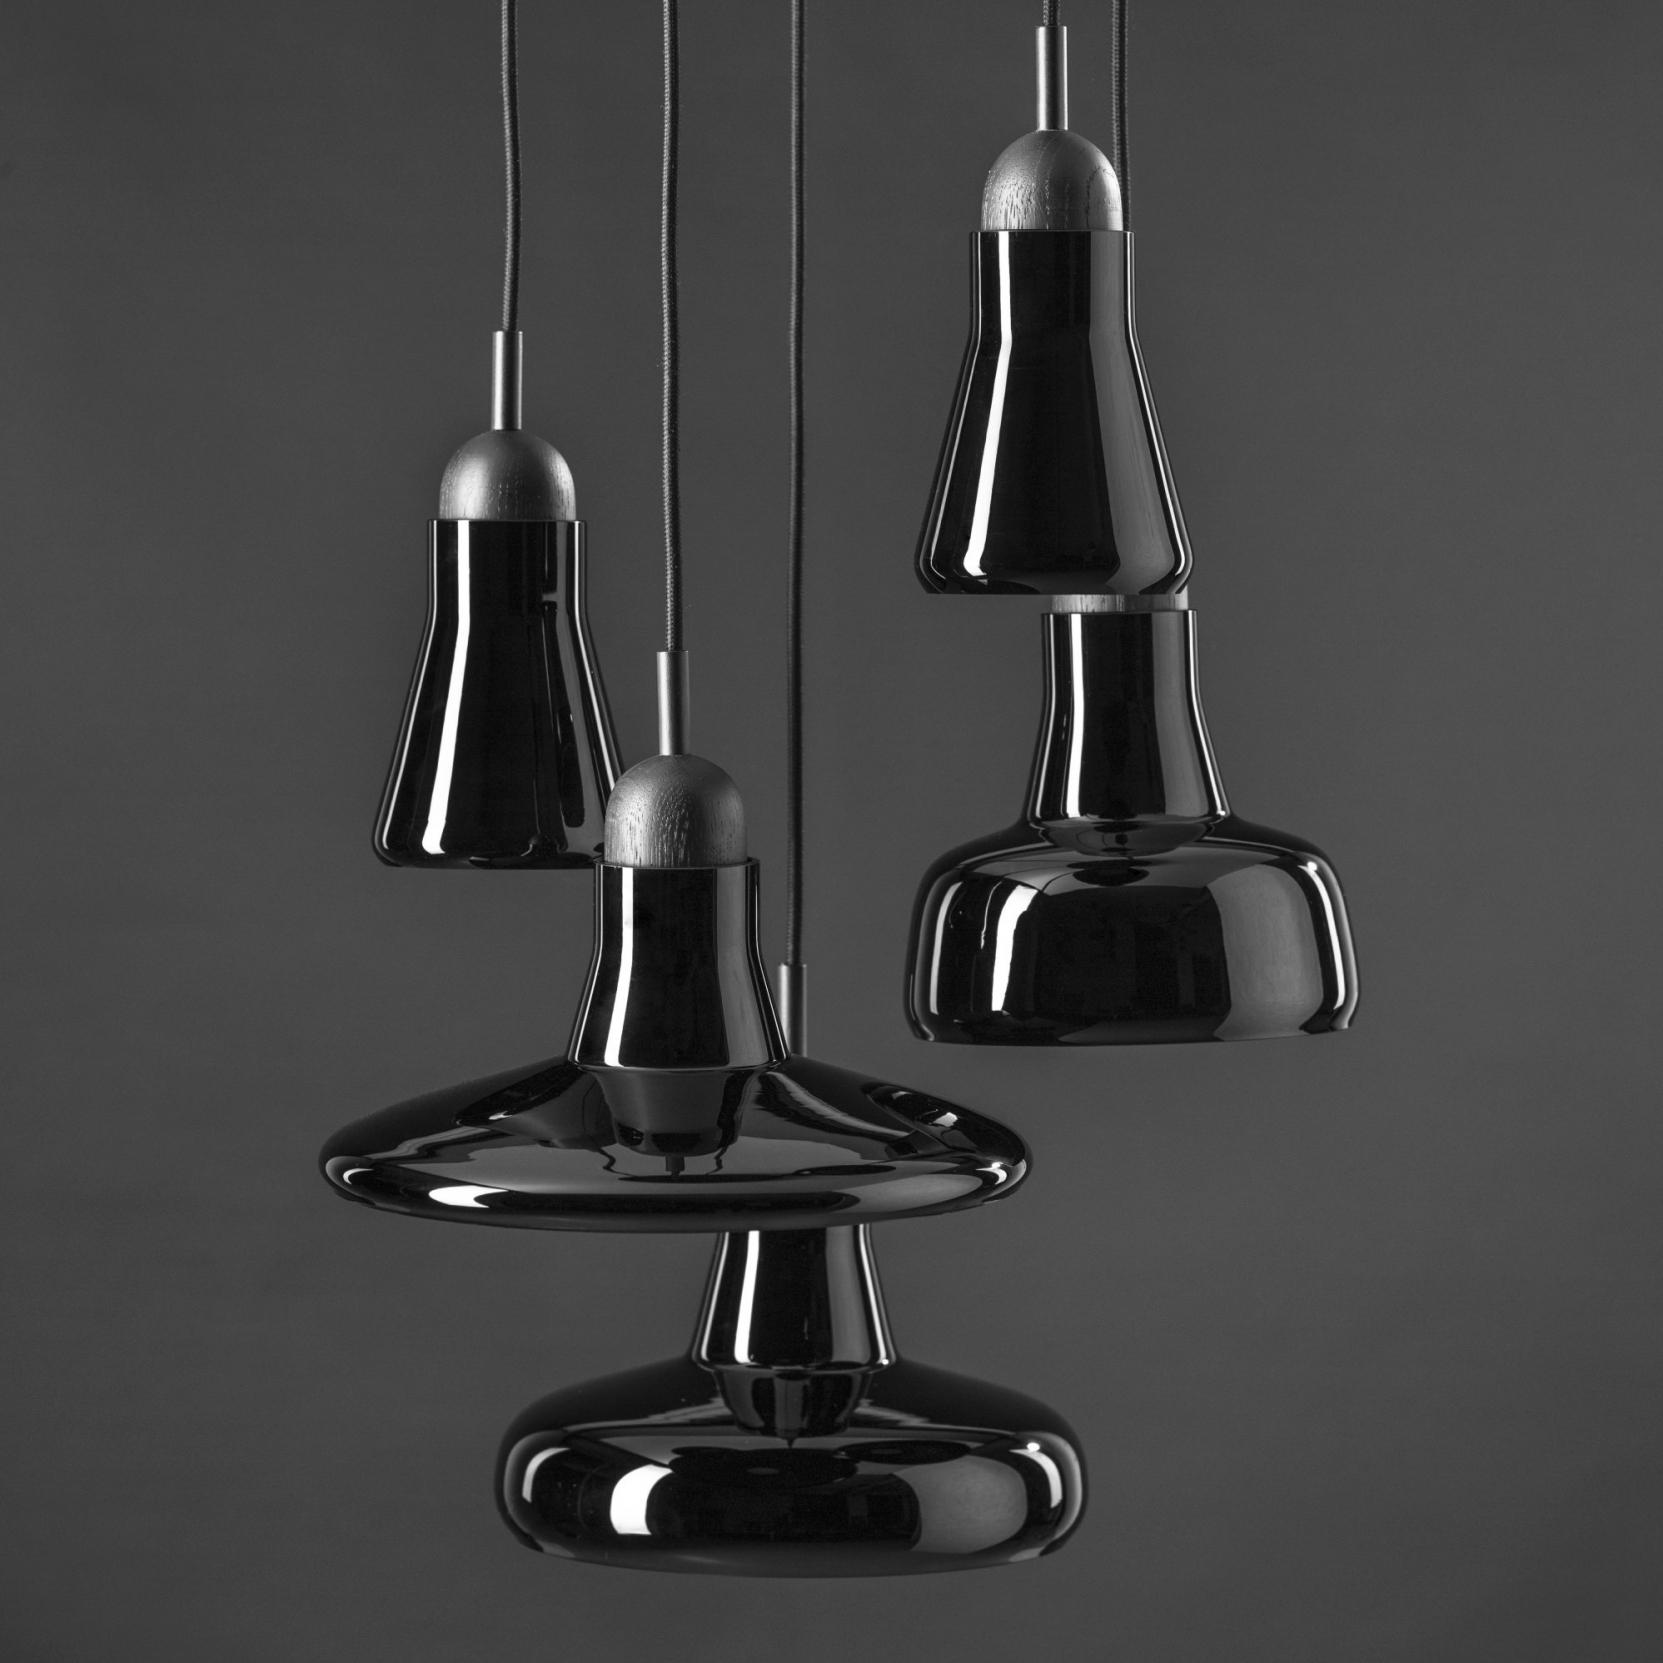 Dan Yeffet & Lucie Koldova brokis shadows lamp pc929 - tattahome